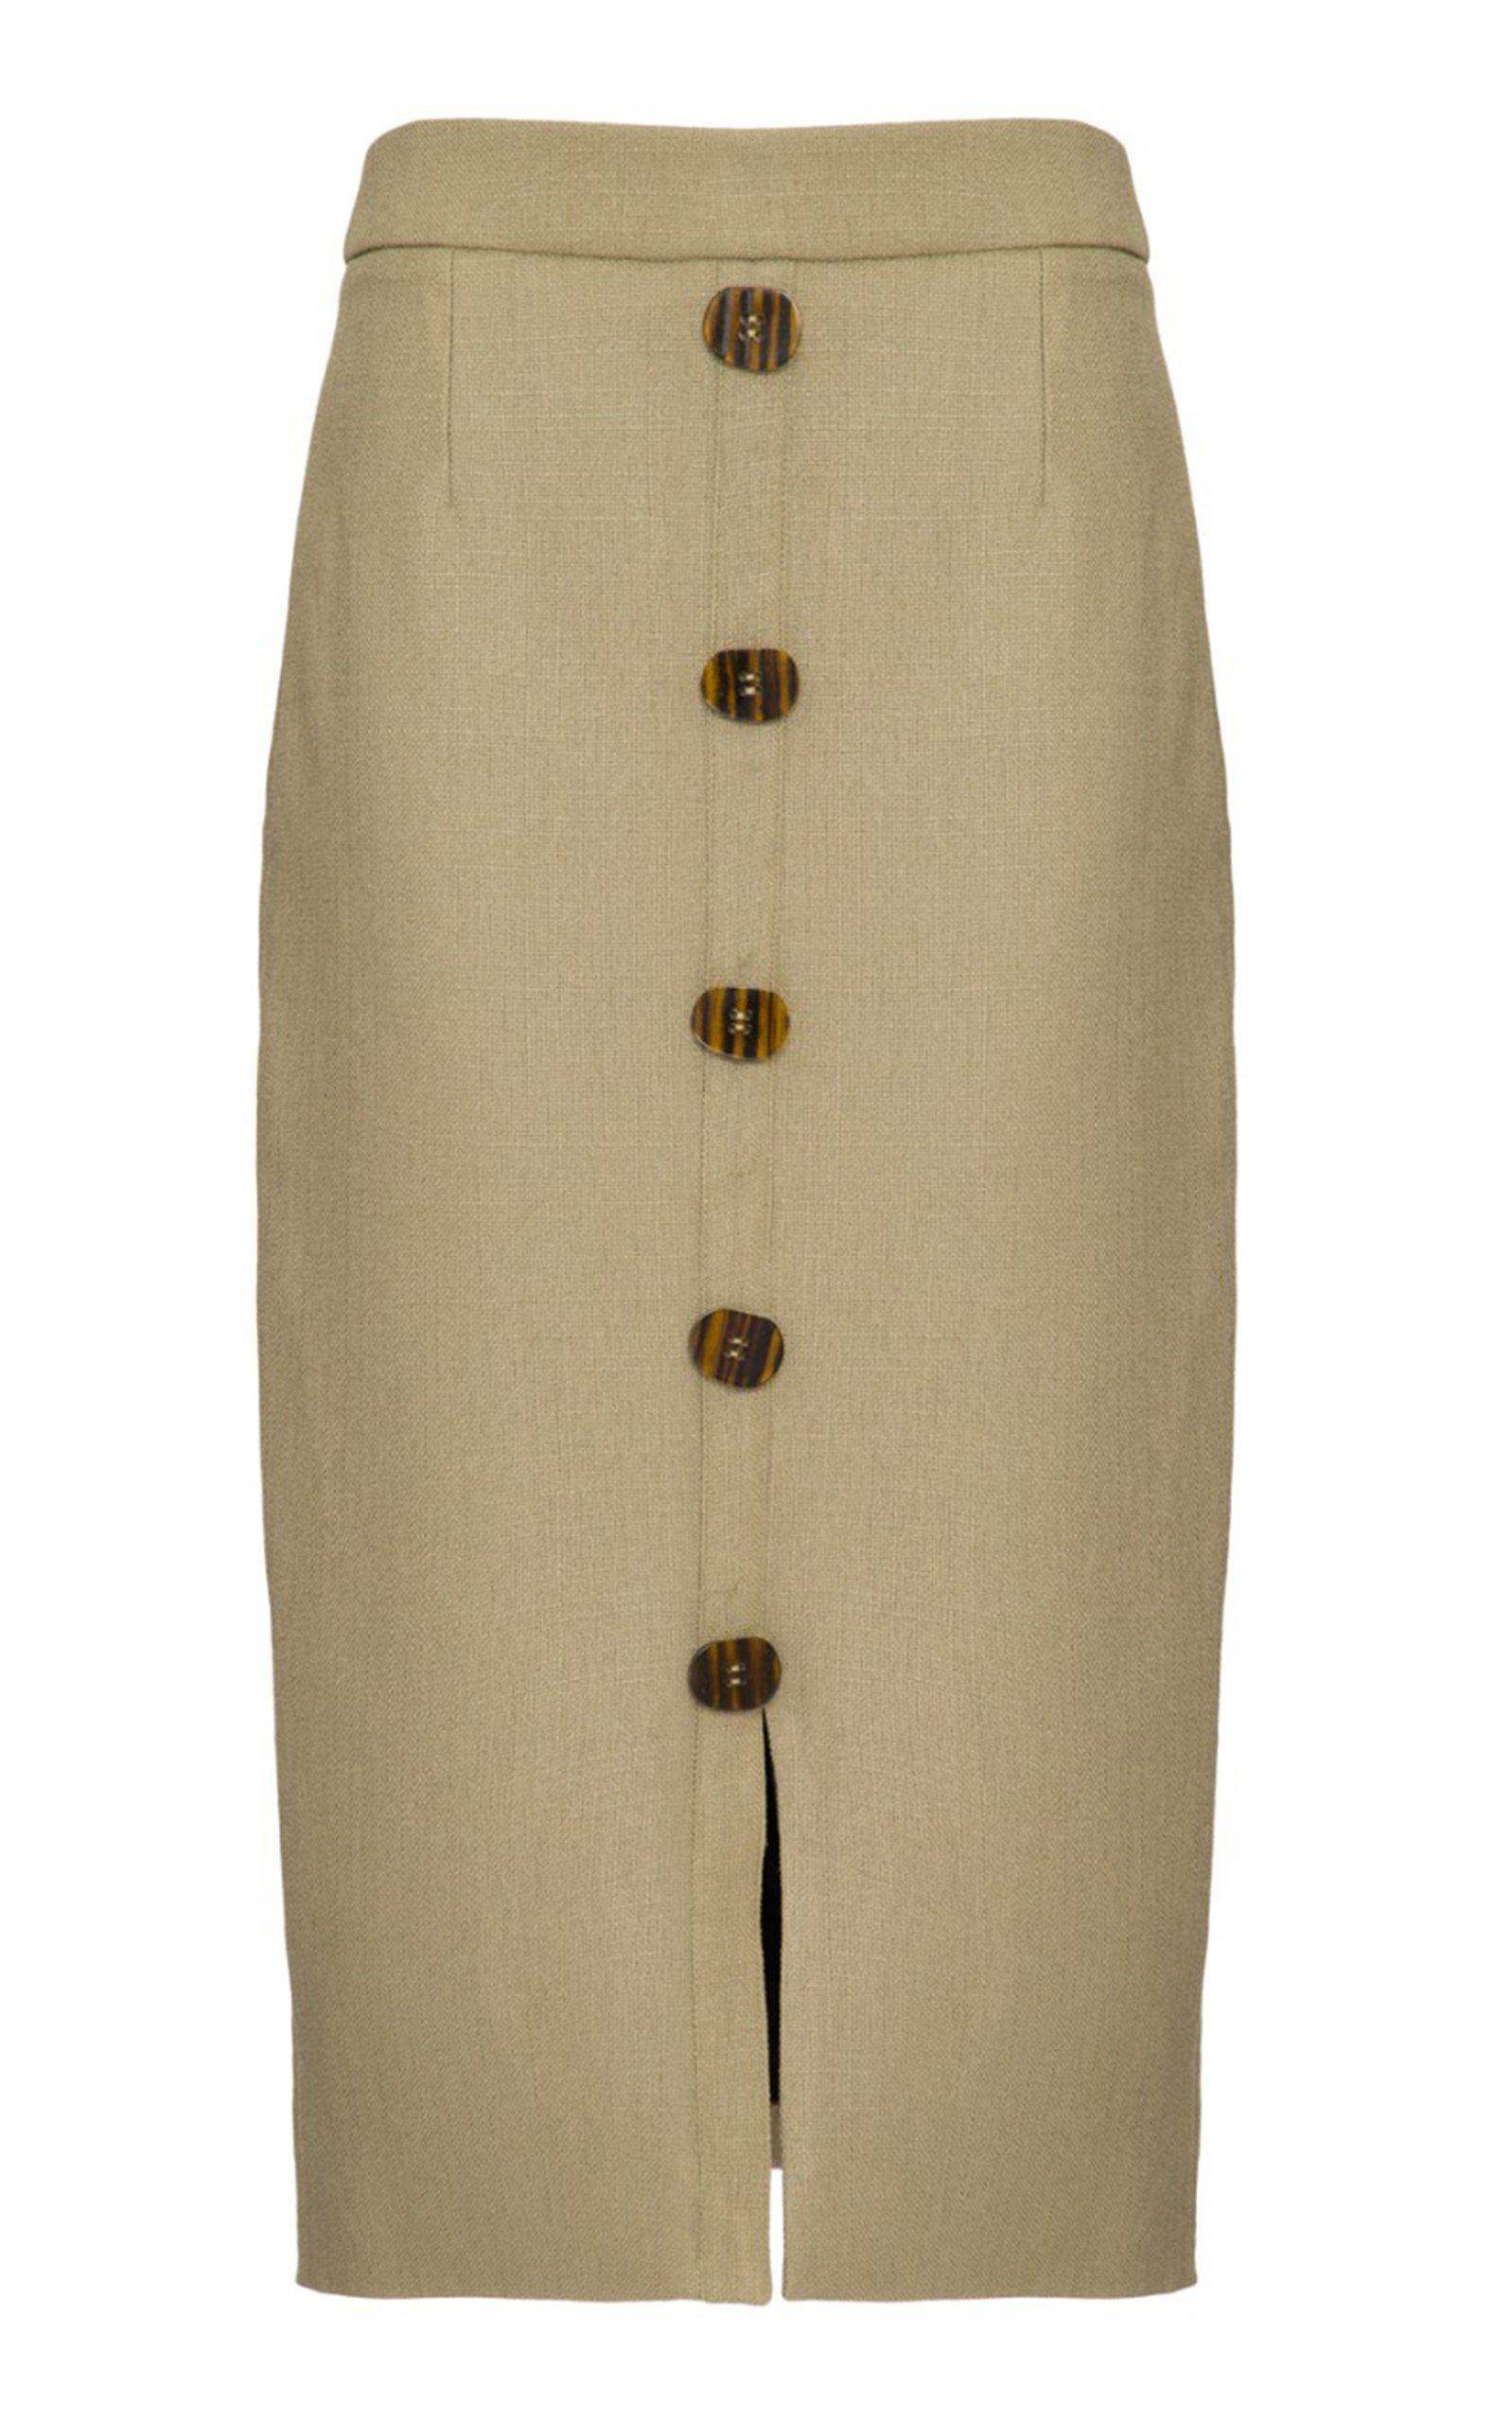 PatBO Linen Pencil Skirt Size: 12